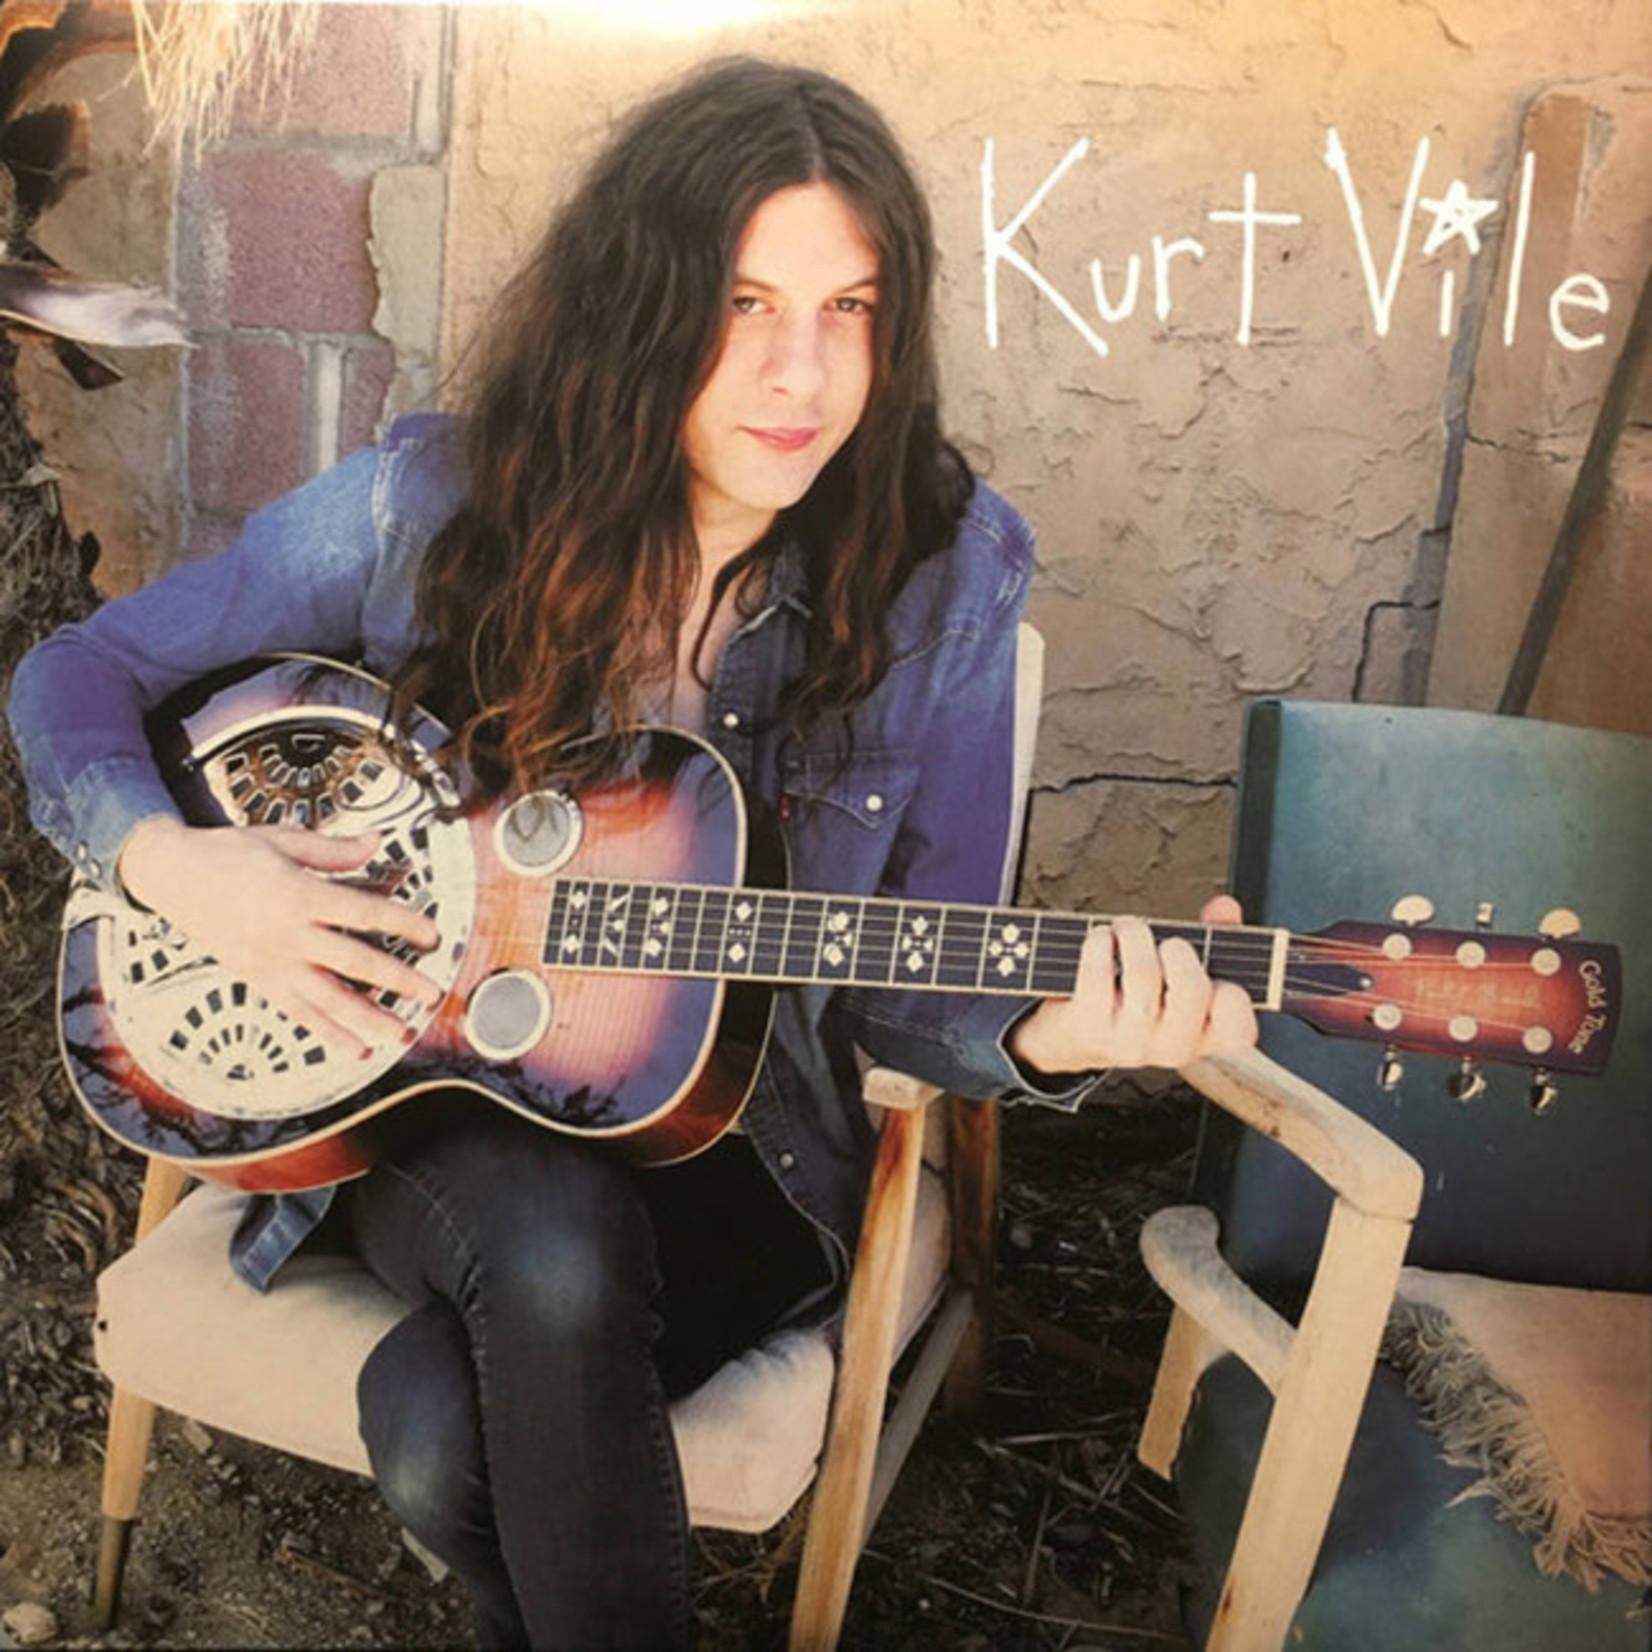 [New] Vile, Kurt: B'lieve I'm Going Down... (2LP)